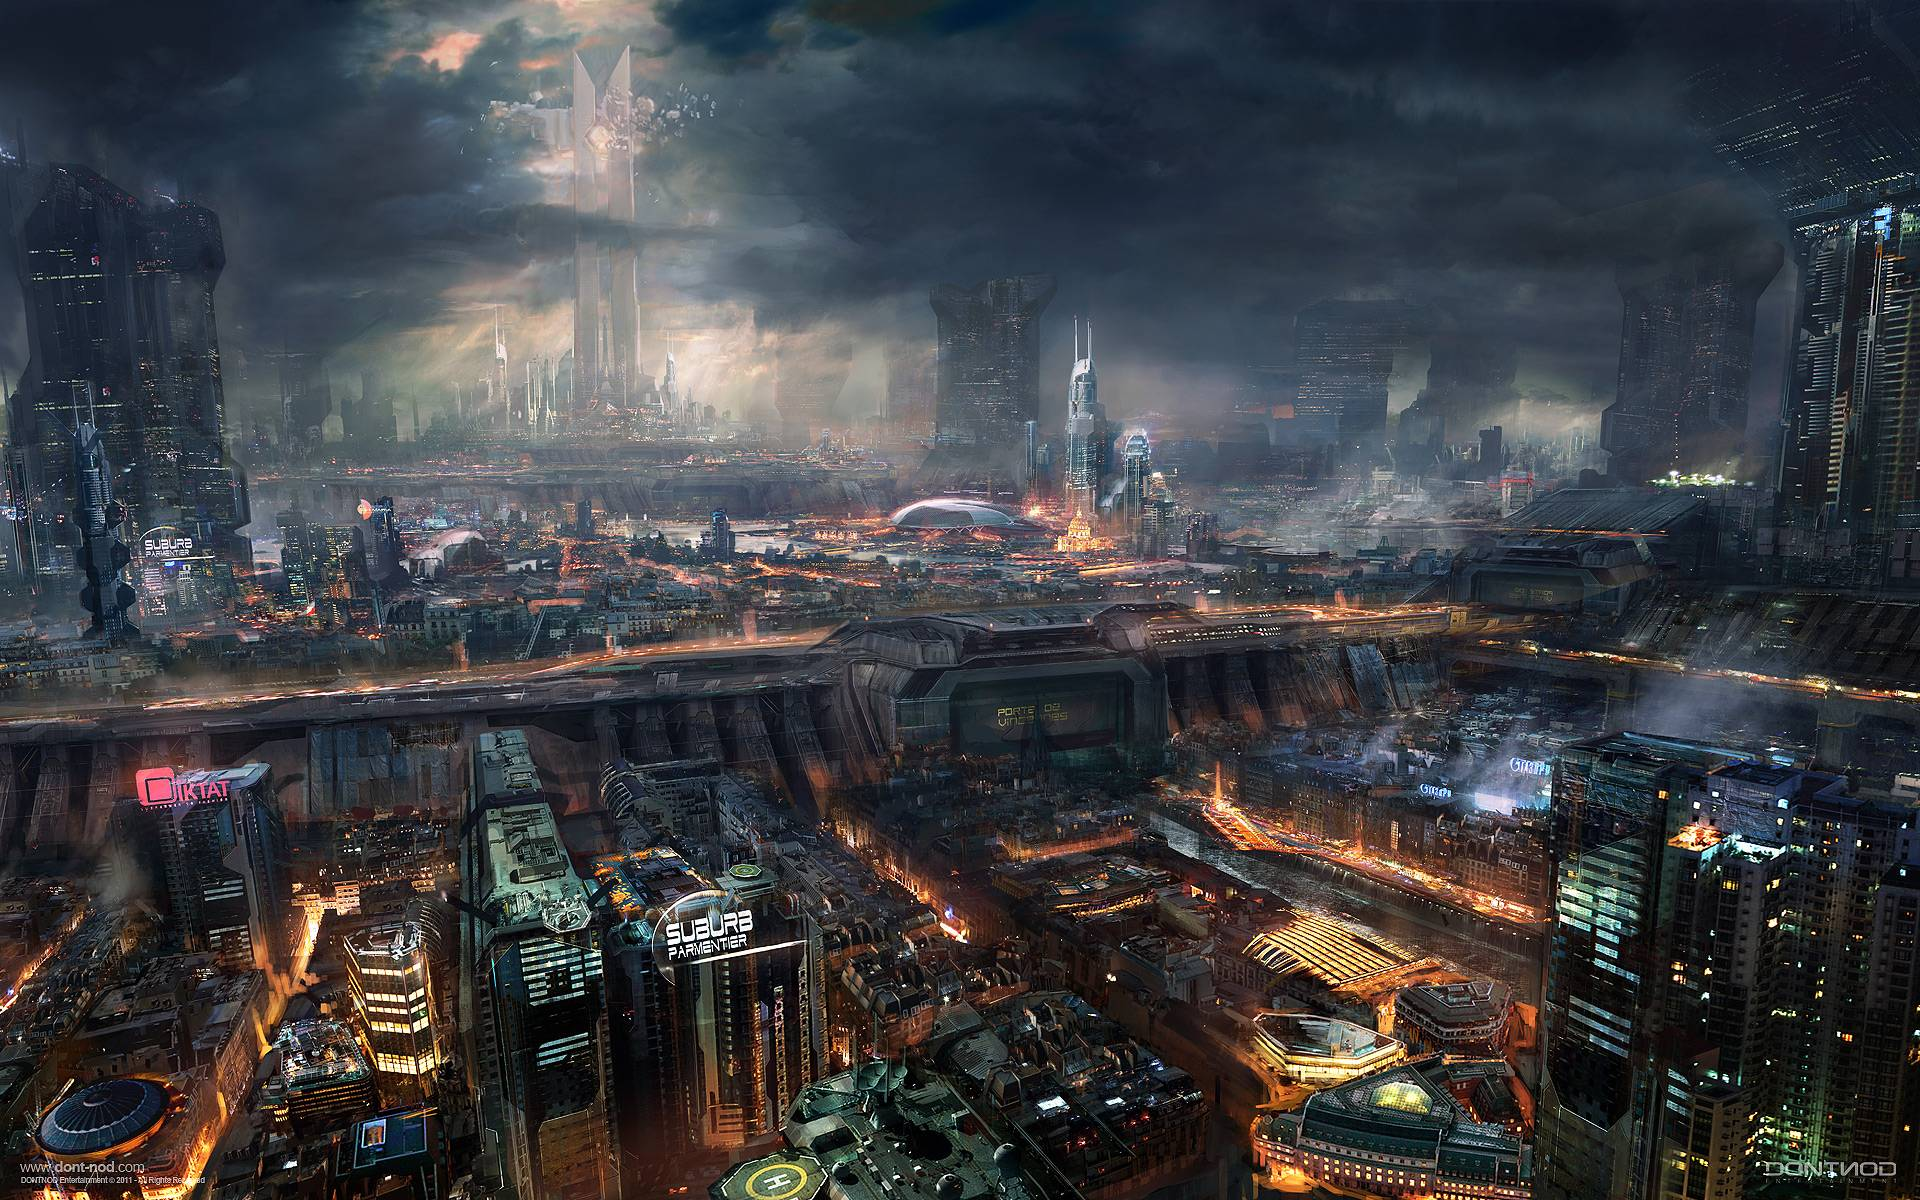 General 1920x1200 cyberpunk Remember Me futuristic concept art detailed futuristic city artwork video games digital art science fiction